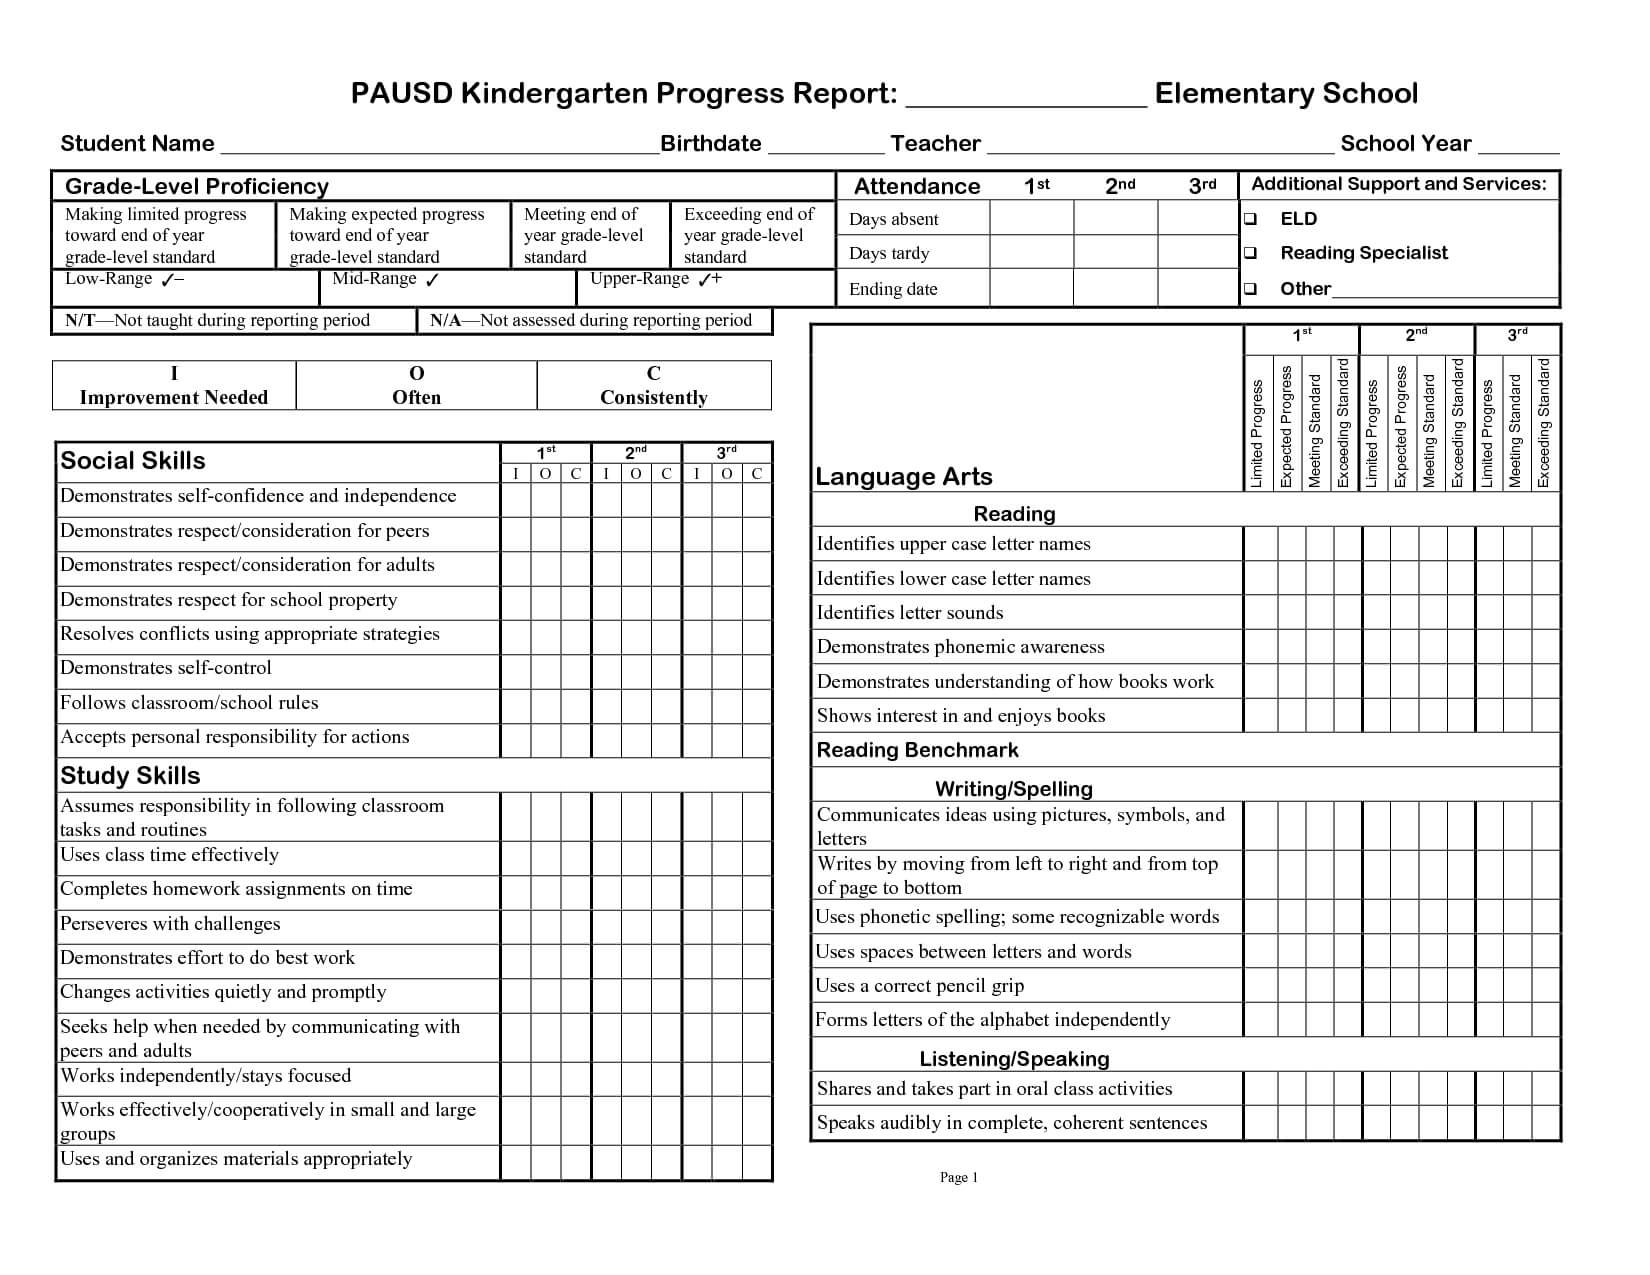 Kindergarten Social Skills Progress Report Blank Templates Intended For High School Progress Report Template